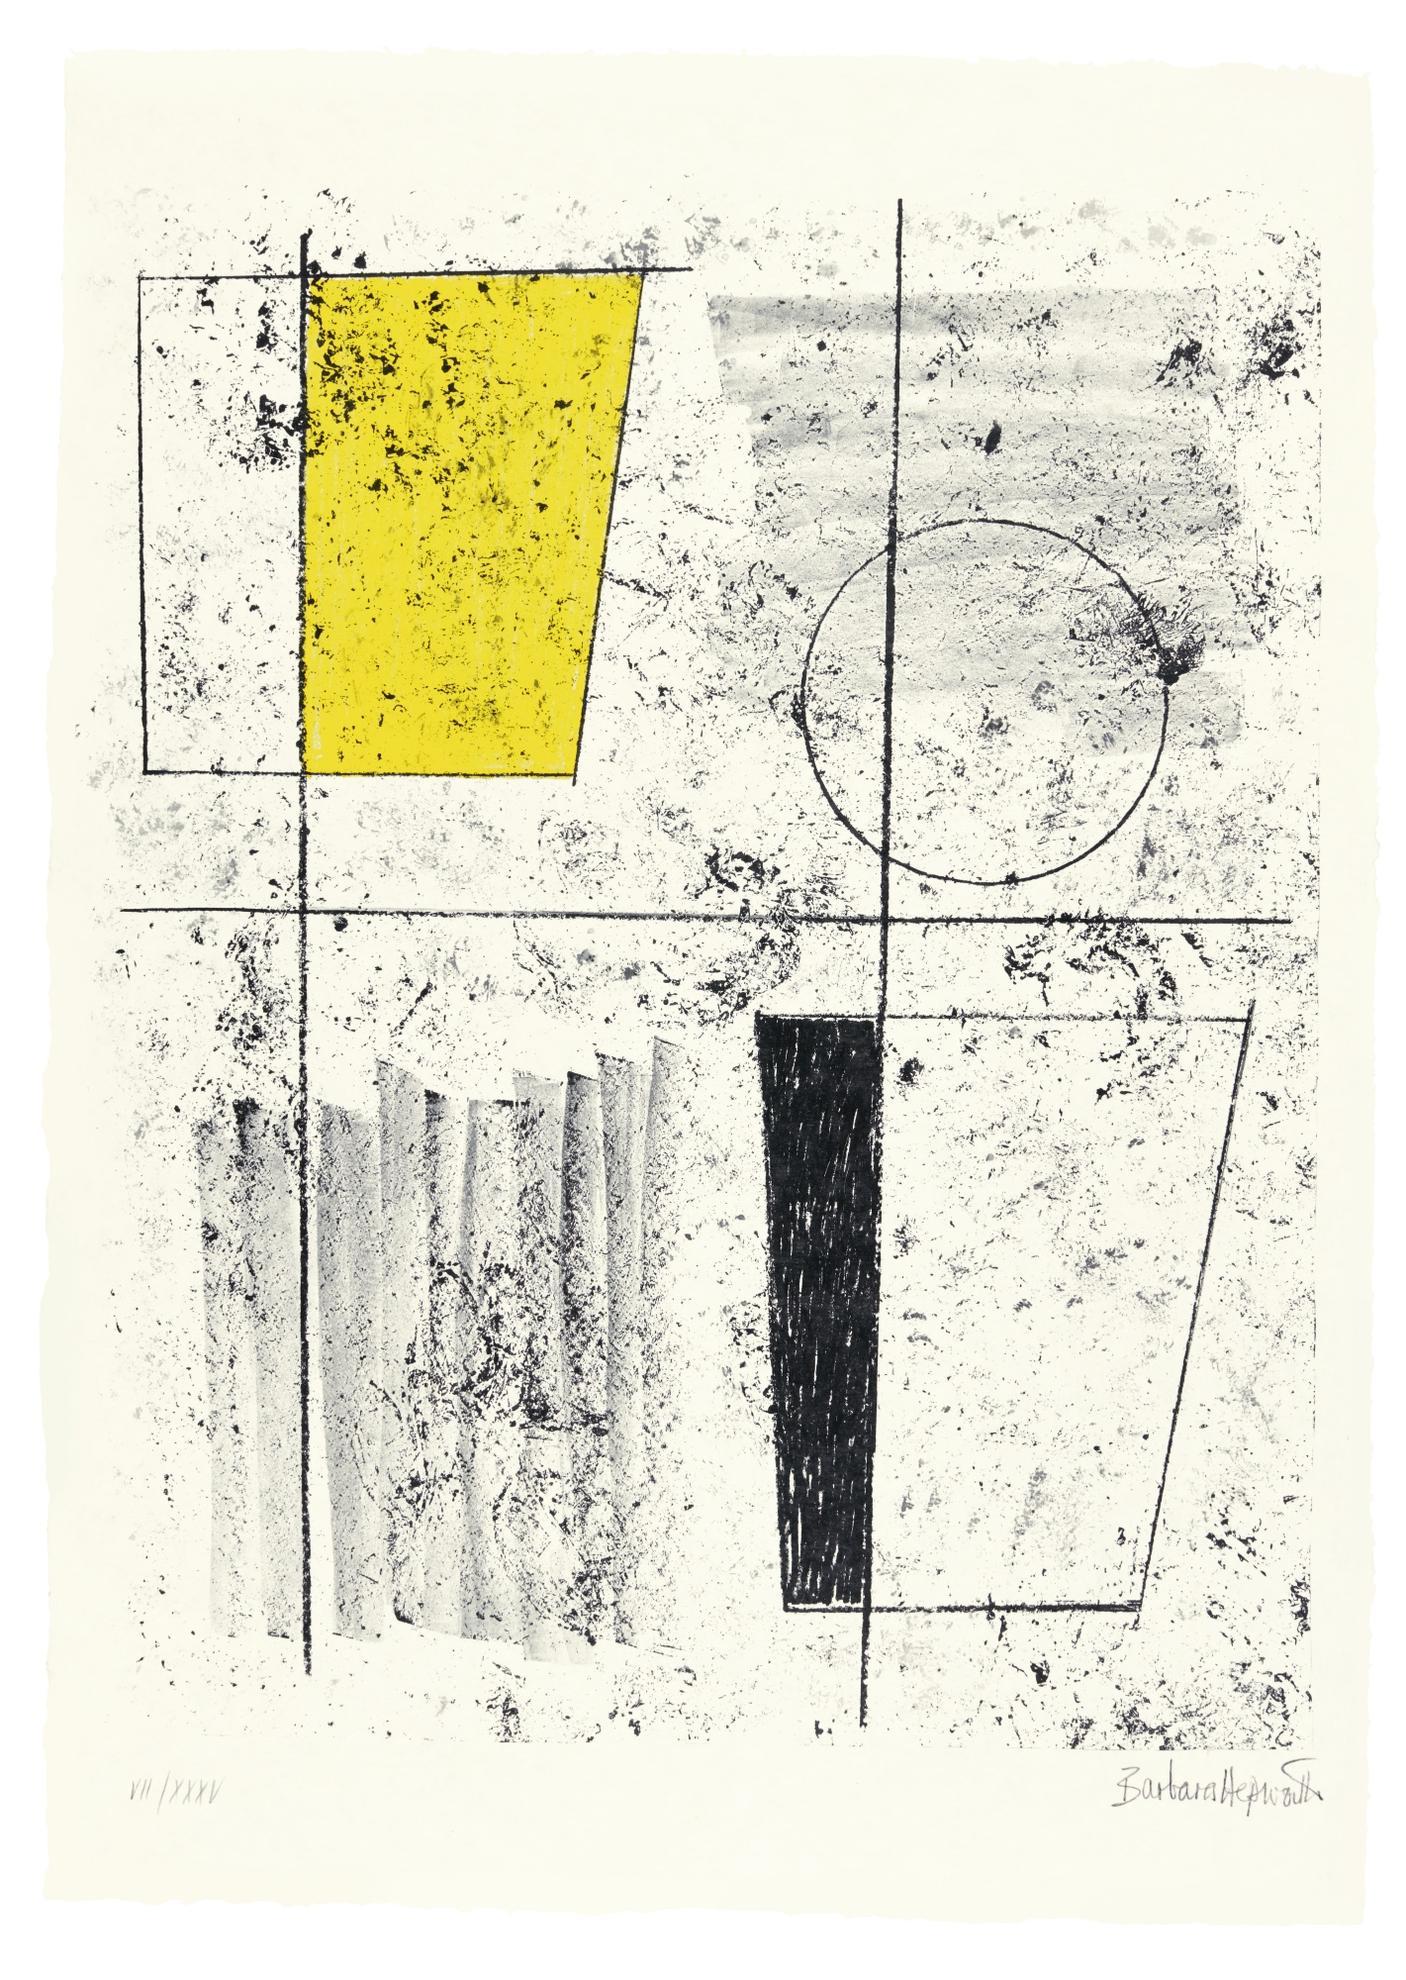 Barbara Hepworth-Three Forms Assembling-1968